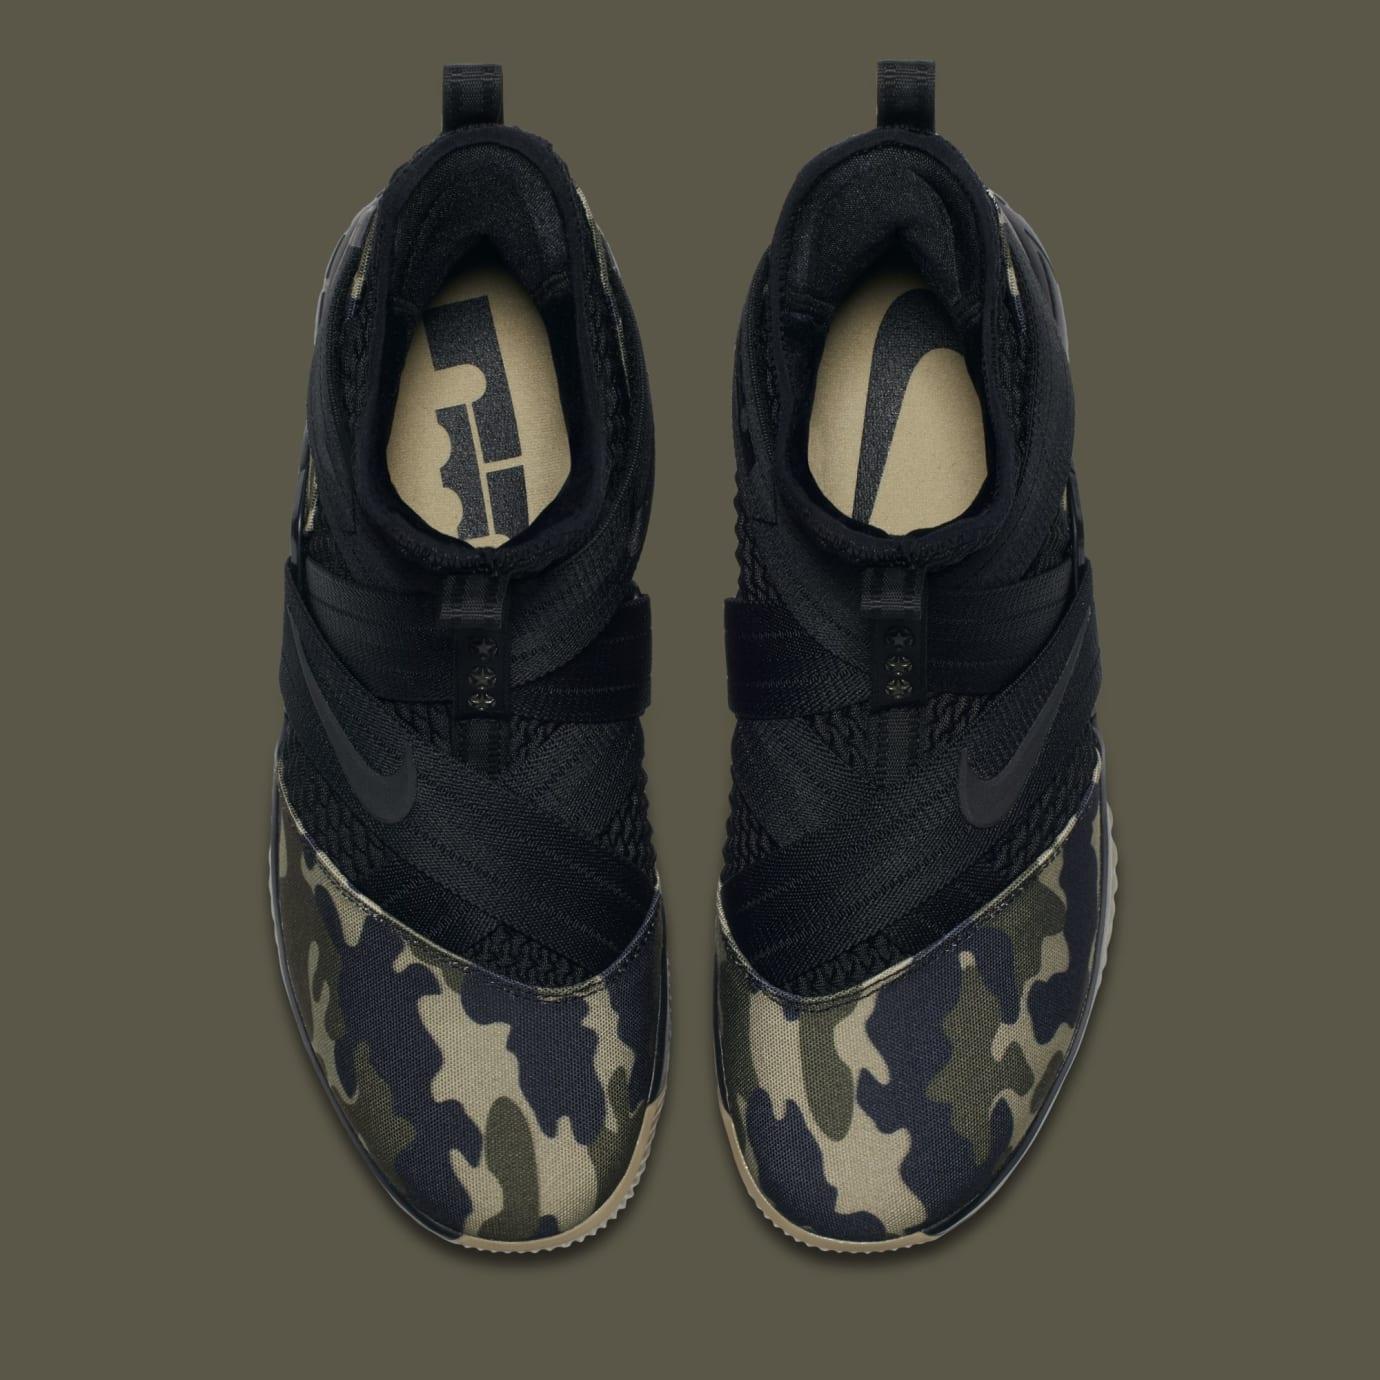 7f5a2f2dfb0 Image via Nike Nike LeBron Solider 12 SFG  Hazel Rush  AO4054-001 (Top)